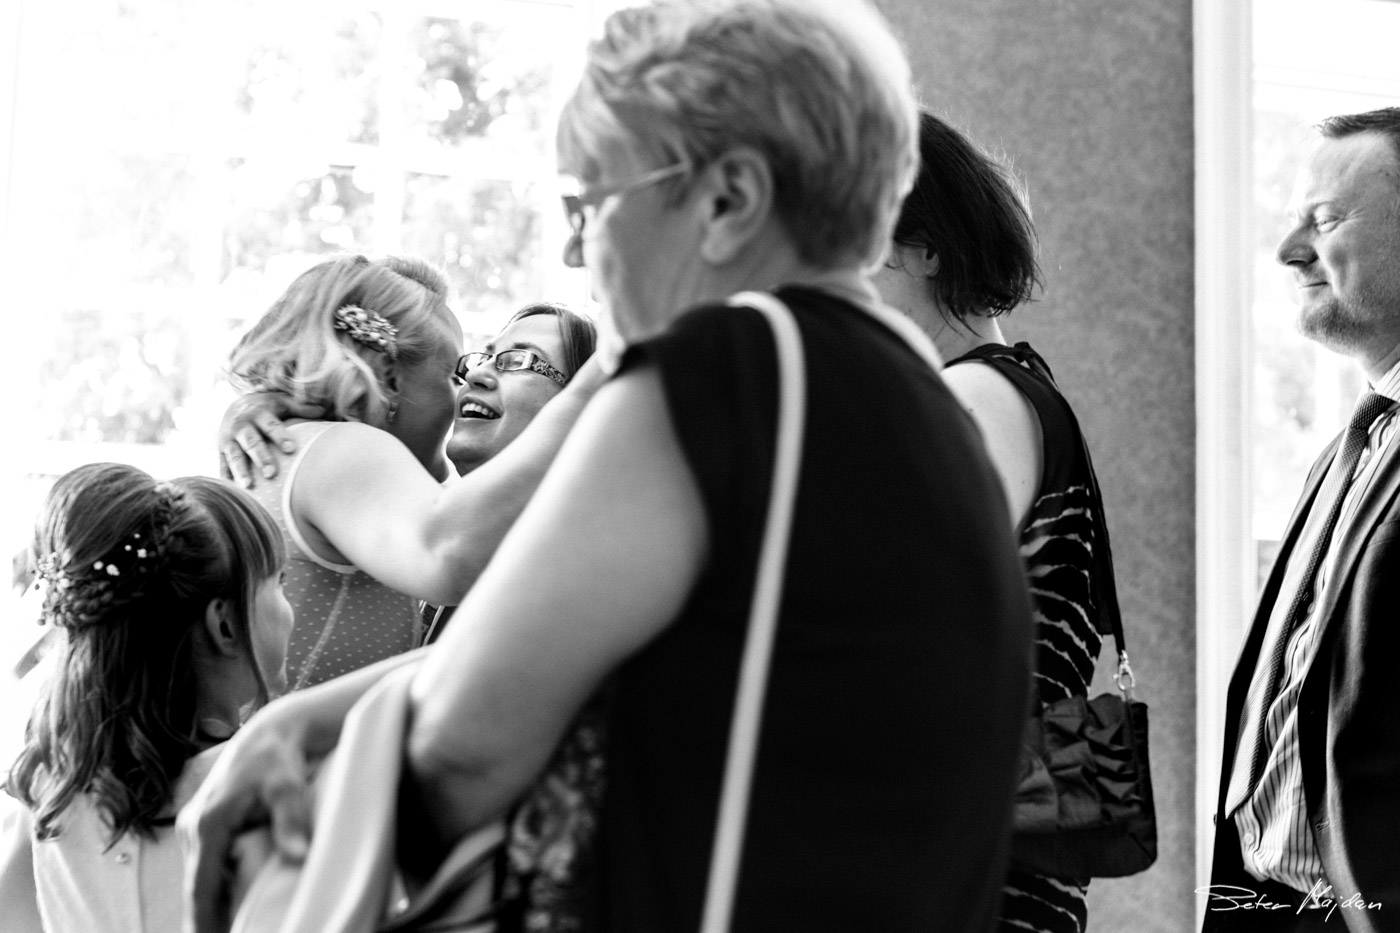 Colwick-hall-wedding-photography-28.jpg